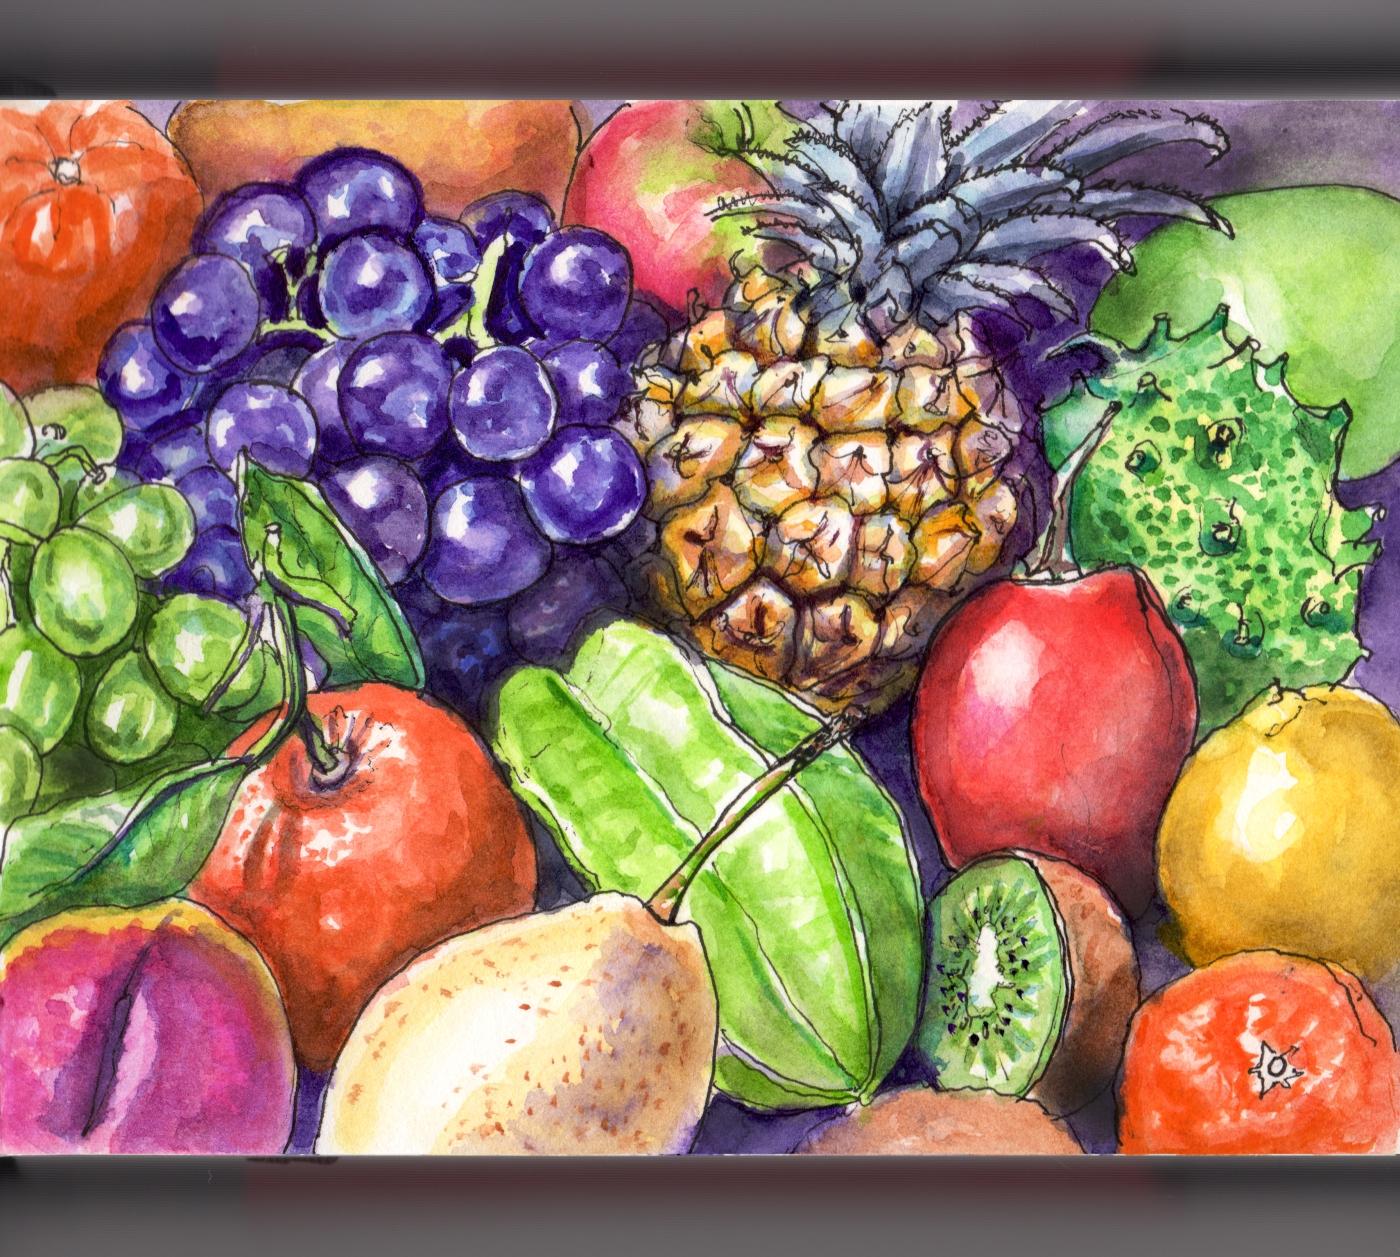 Day 4 - #WorldWatercolorGroup Mixed Fruit Fruits Pineapple Grapes Apples Lemons Pears Oranges Kiwi